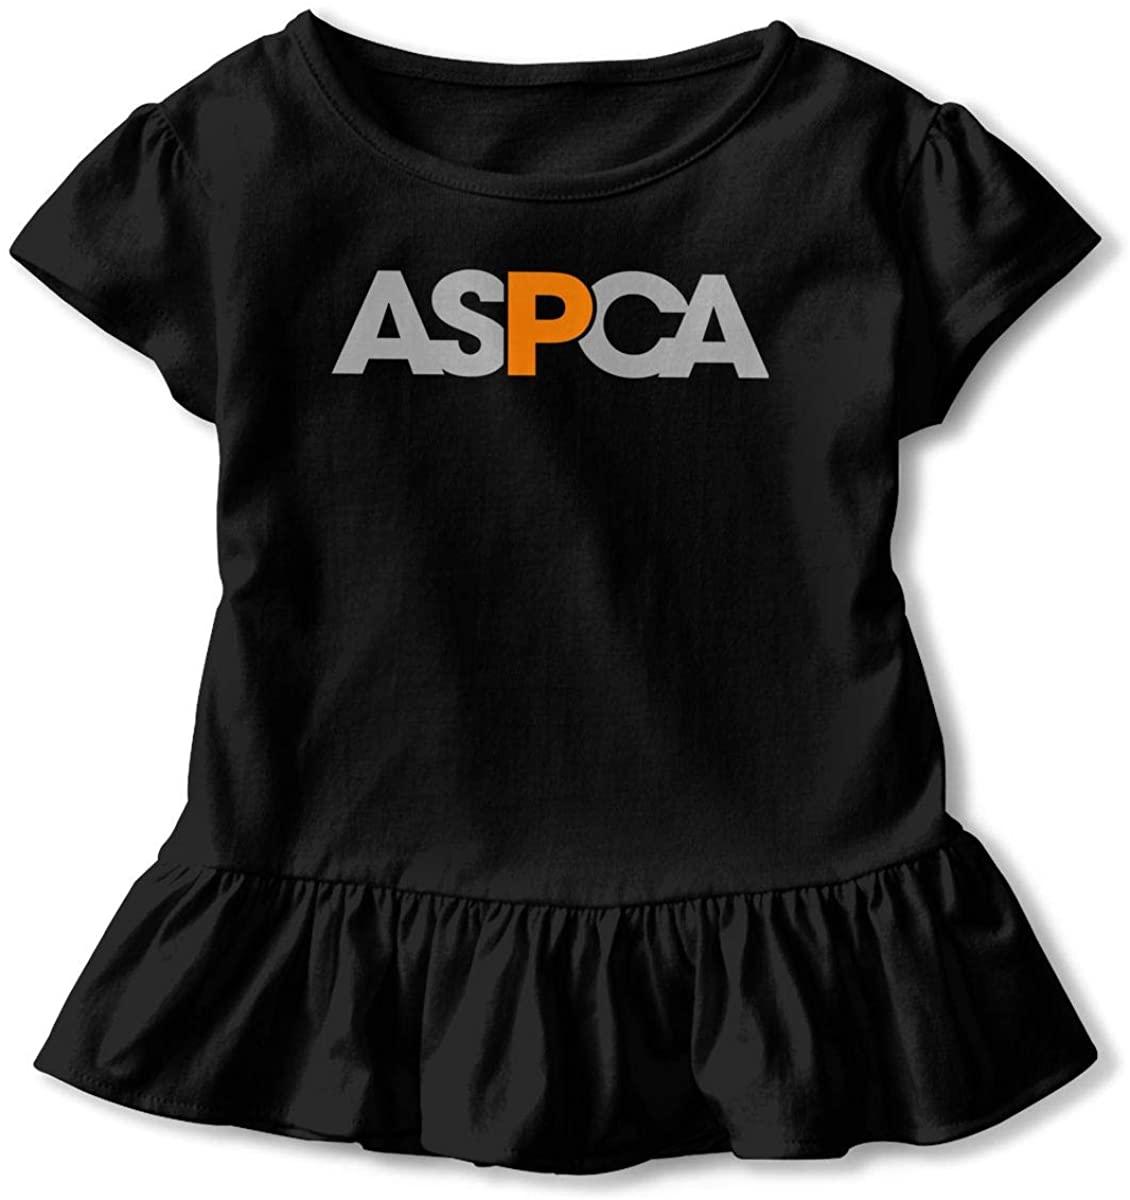 AP.Room ASPCA Toddler Girl's Ruffle T-Shirt Short Sleeve 2-6t